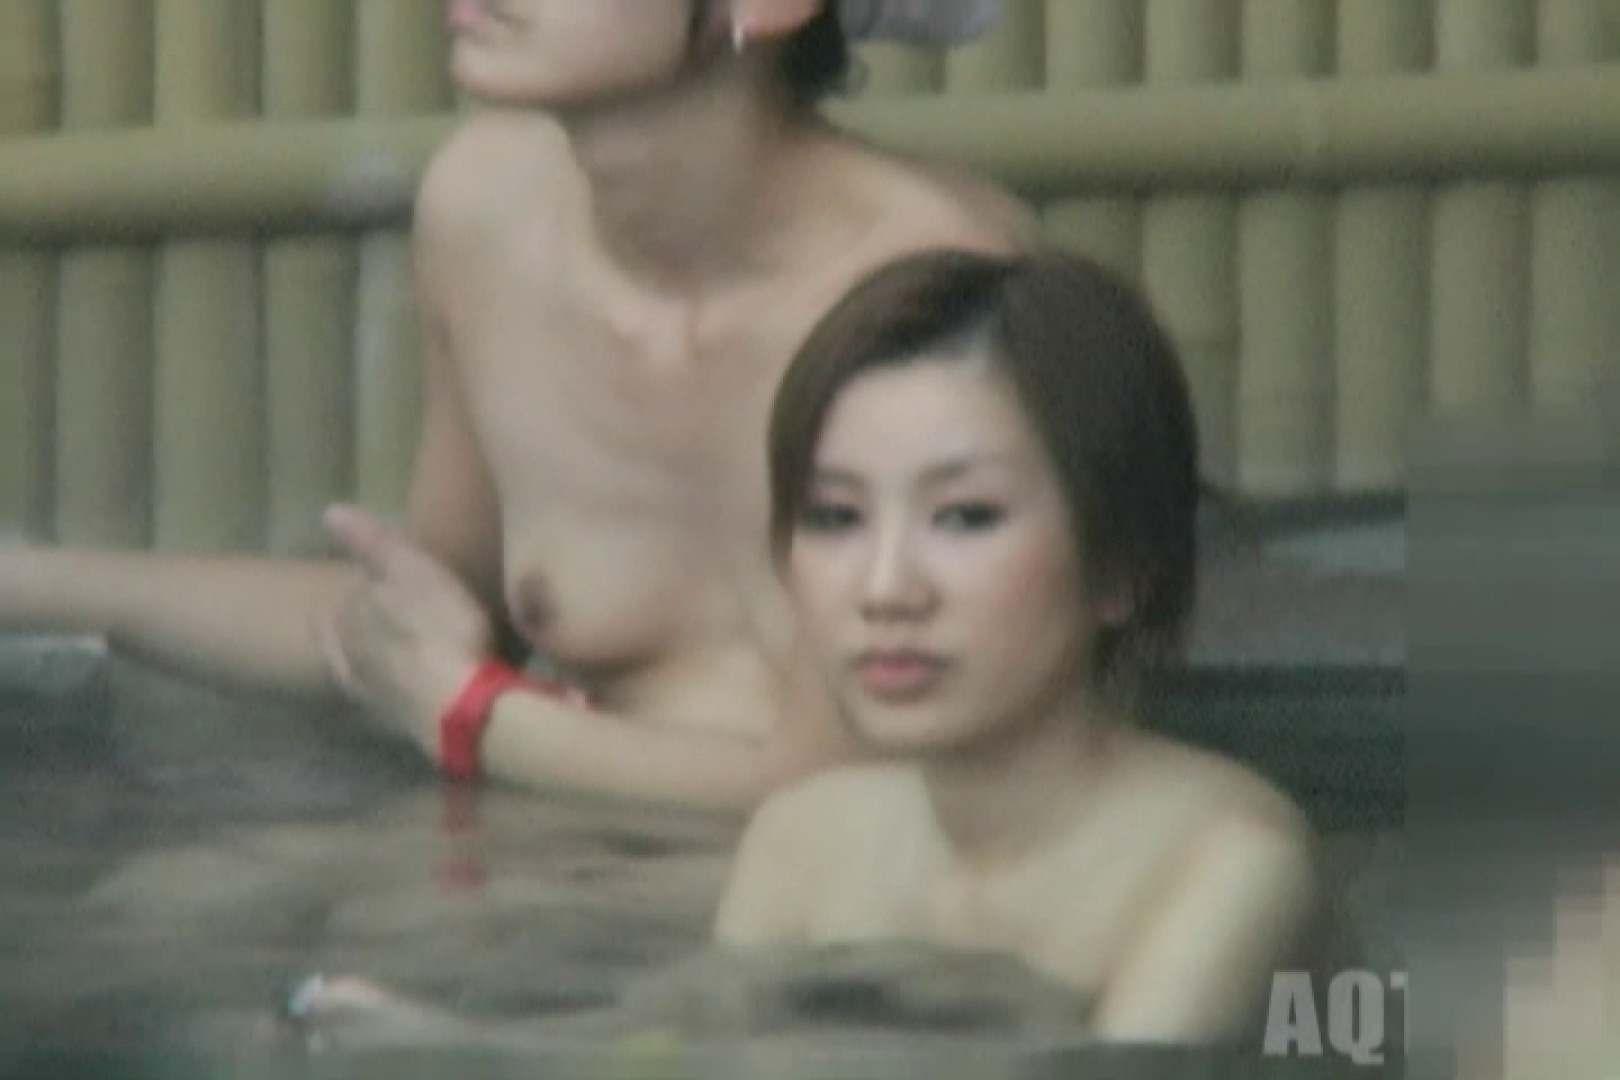 Aquaな露天風呂Vol.857 0   0  91連発 65